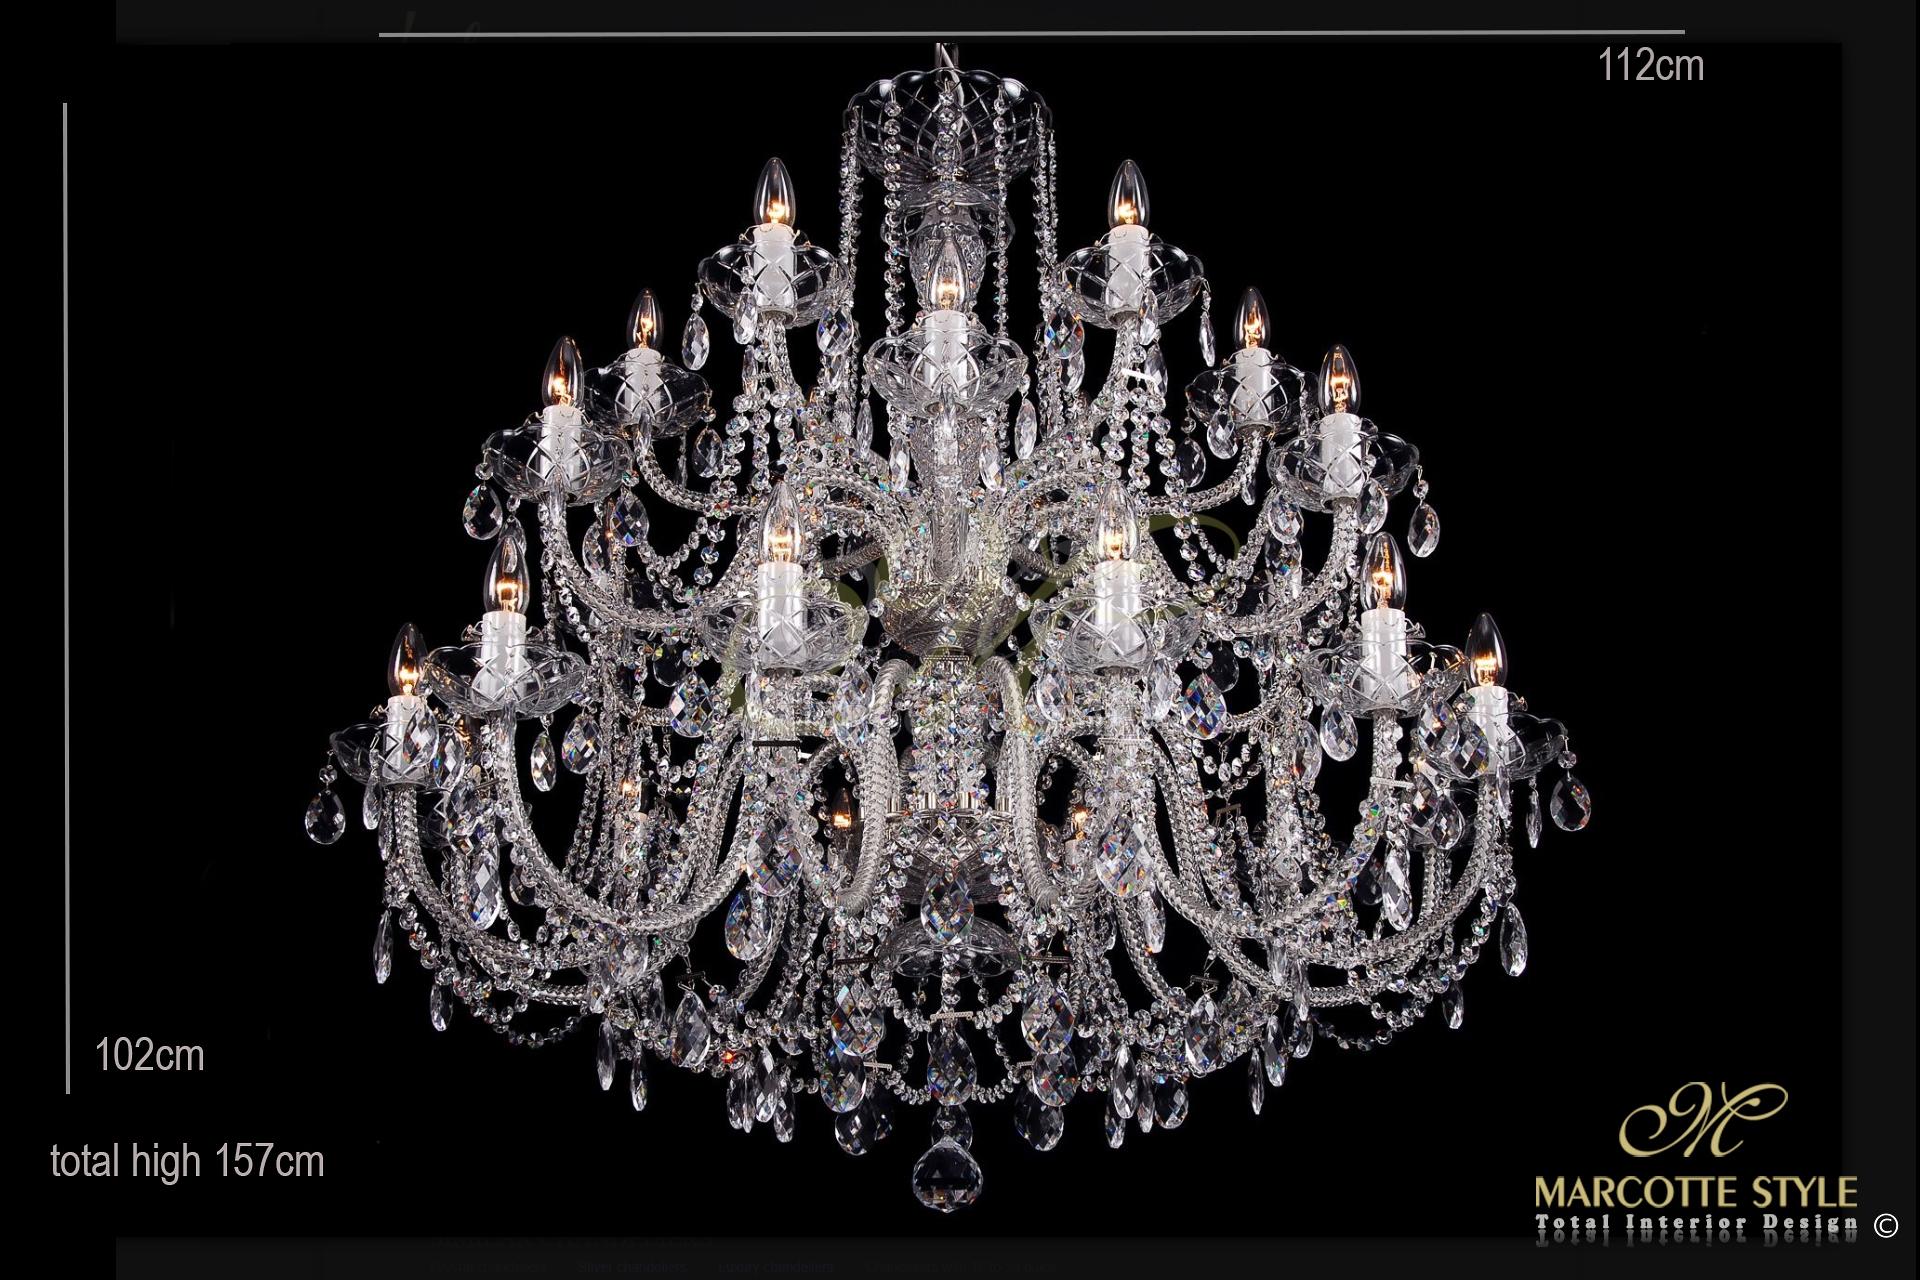 Marcottestyle kristallen kroonluster armen xls marcotte style